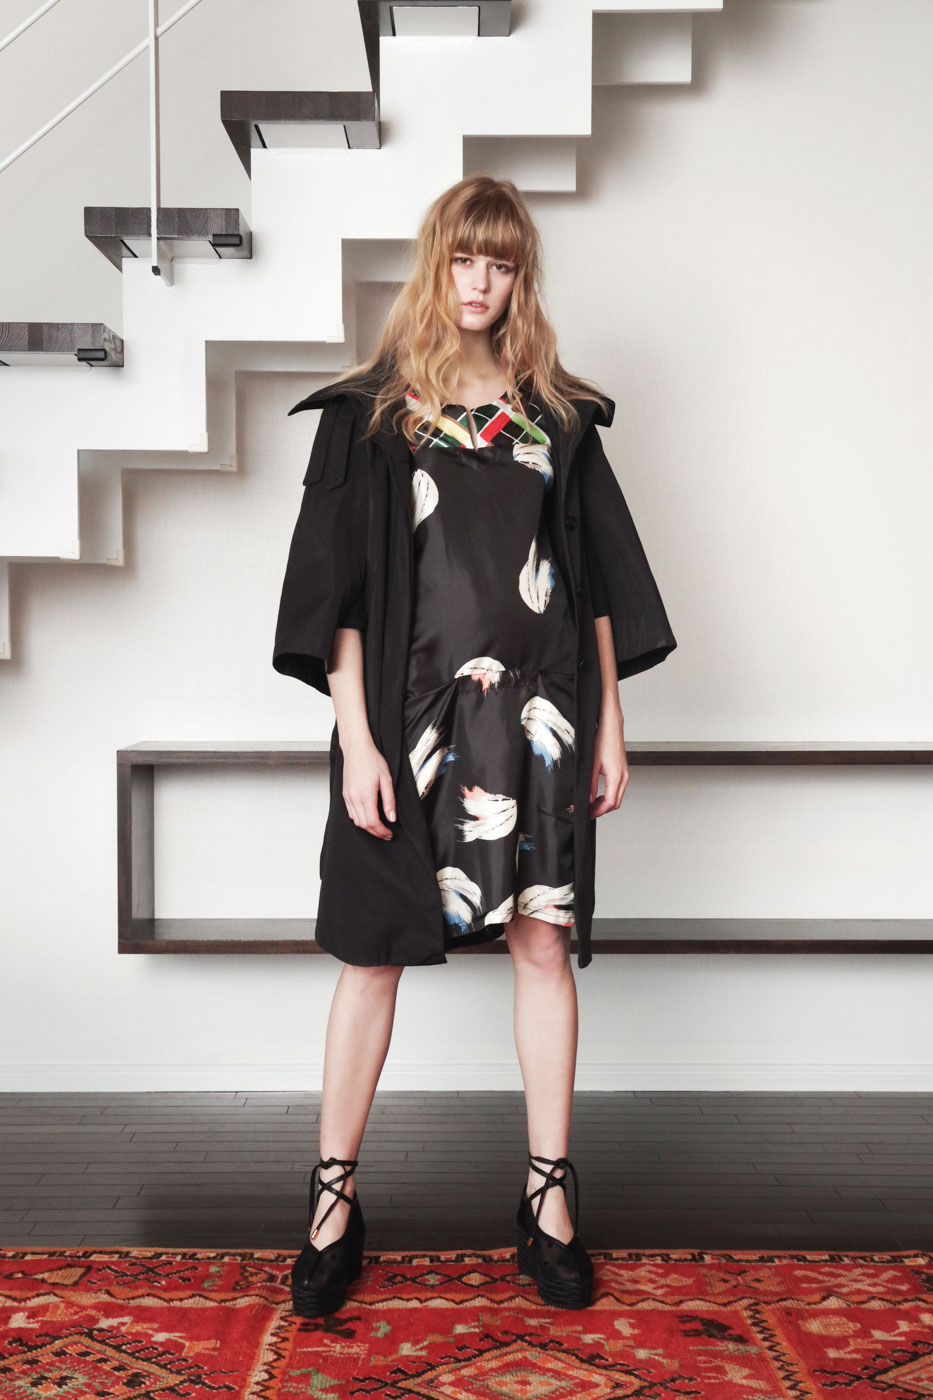 19020 Coat ¥40,000, 19030 Dress ¥32,000